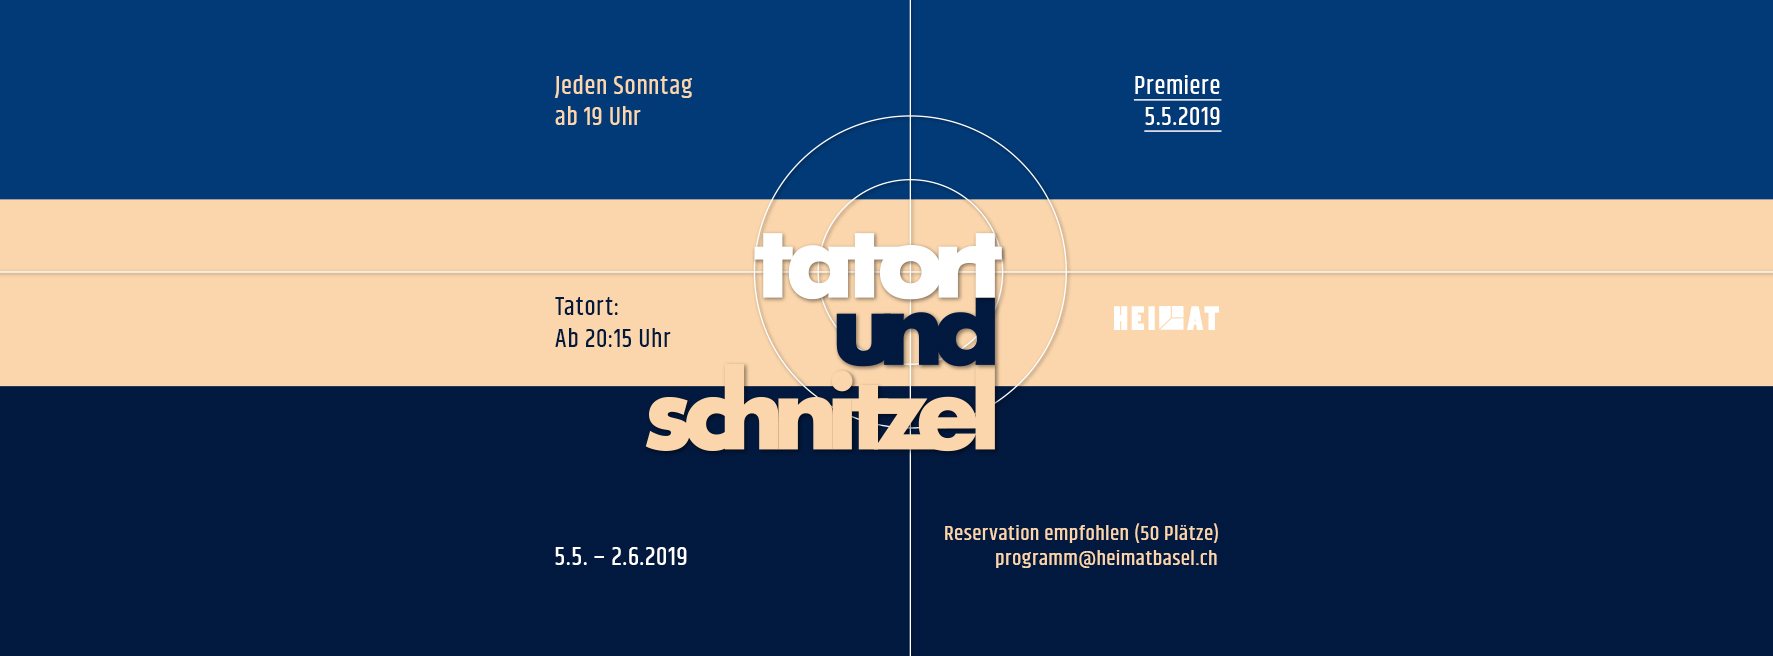 190500_TatortUndSchnitzel_FB1.jpg